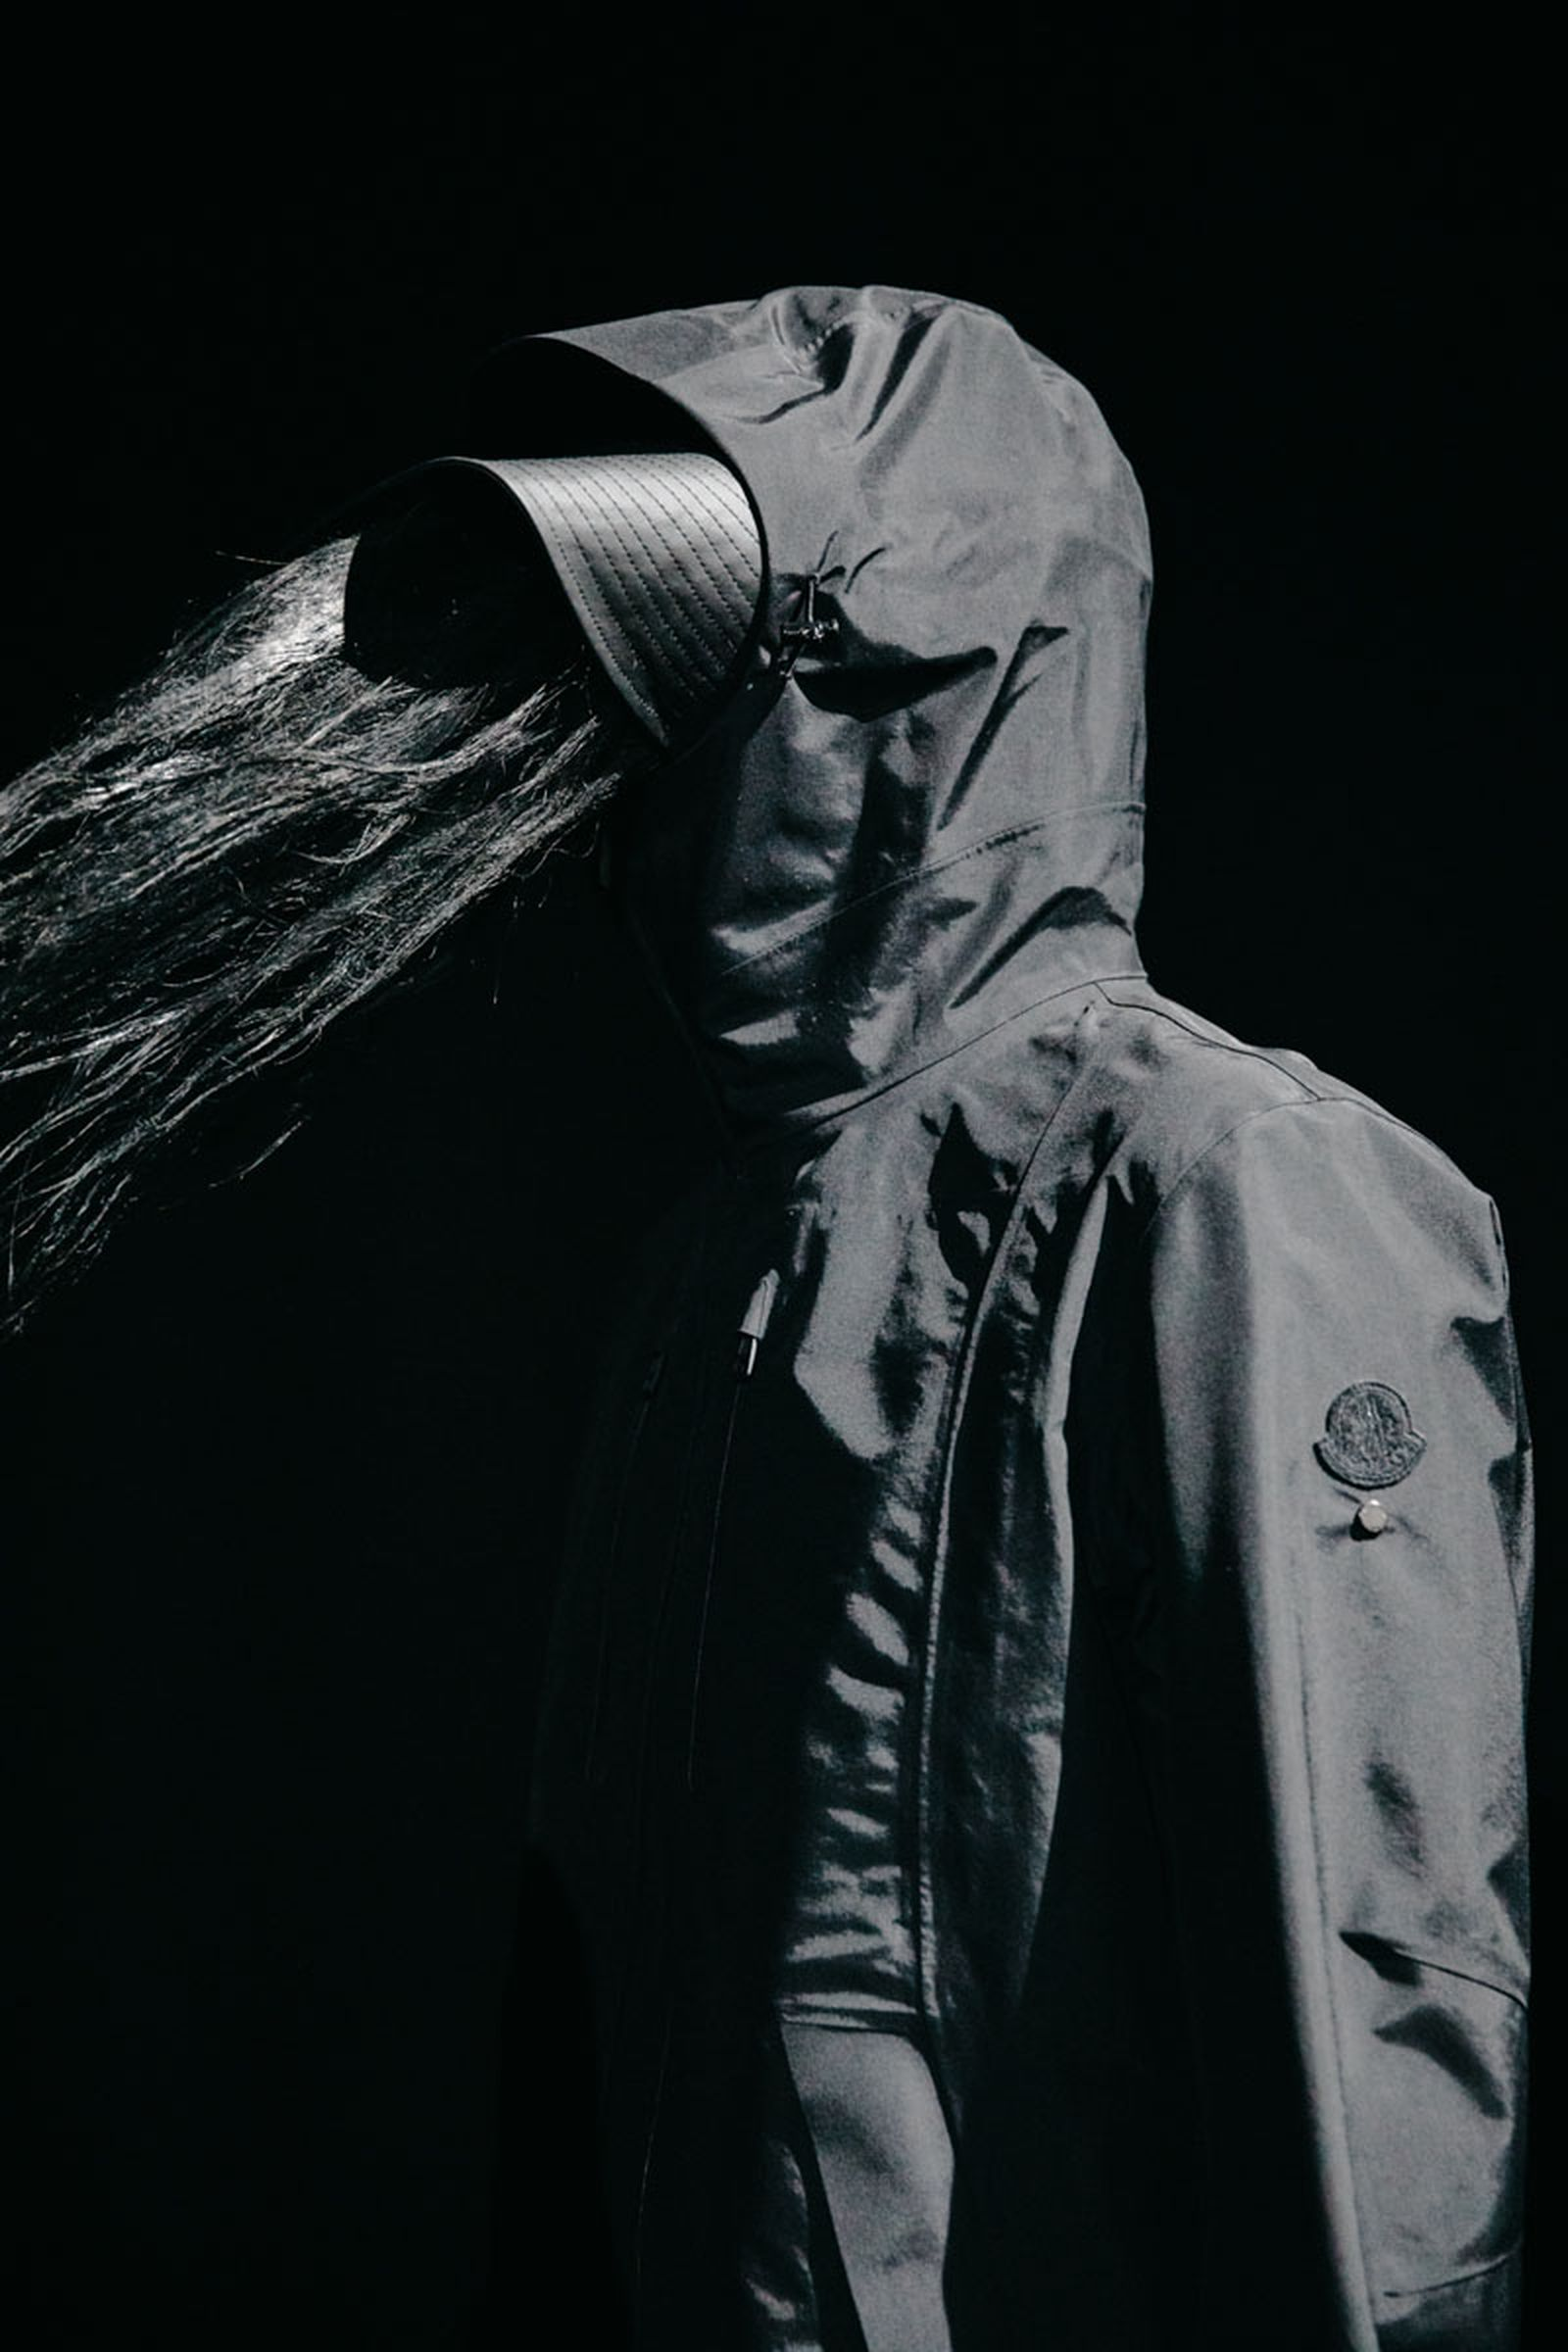 moncler-genius-fall-2020-alyx-09